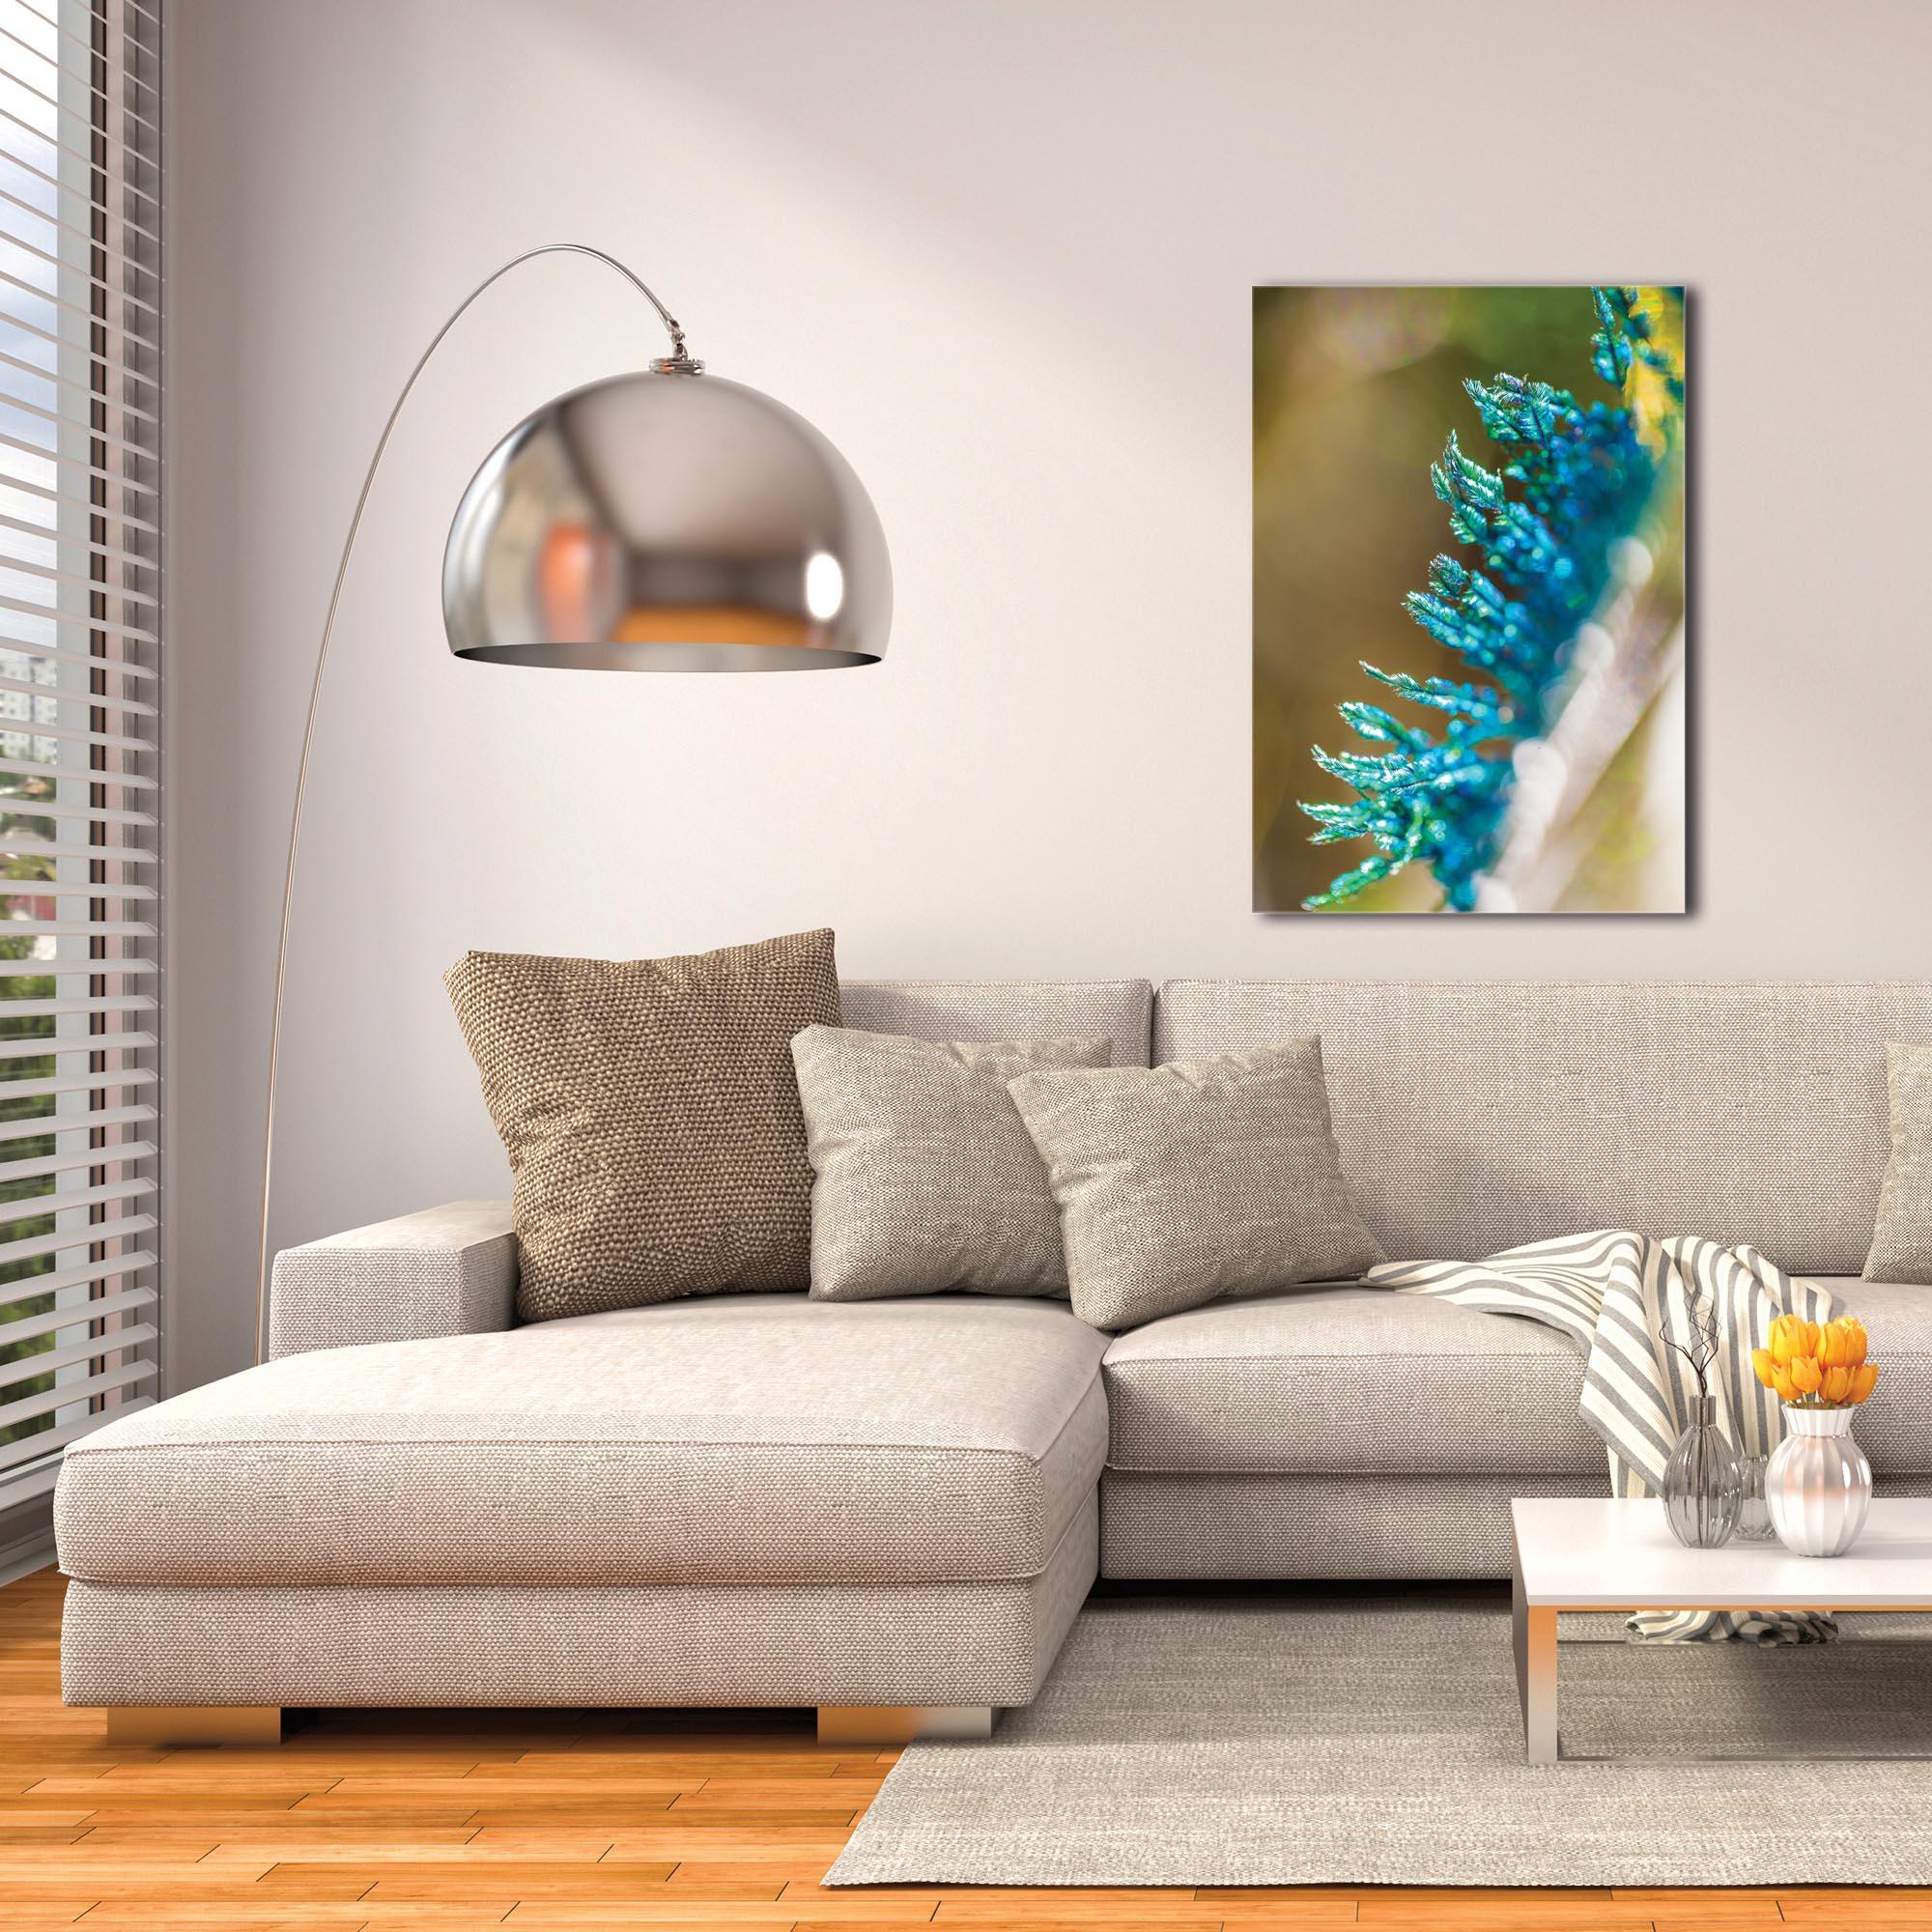 Contemporary Wall Art 'Feather Closeup' - Peacock Decor on Metal or Plexiglass - Image 3